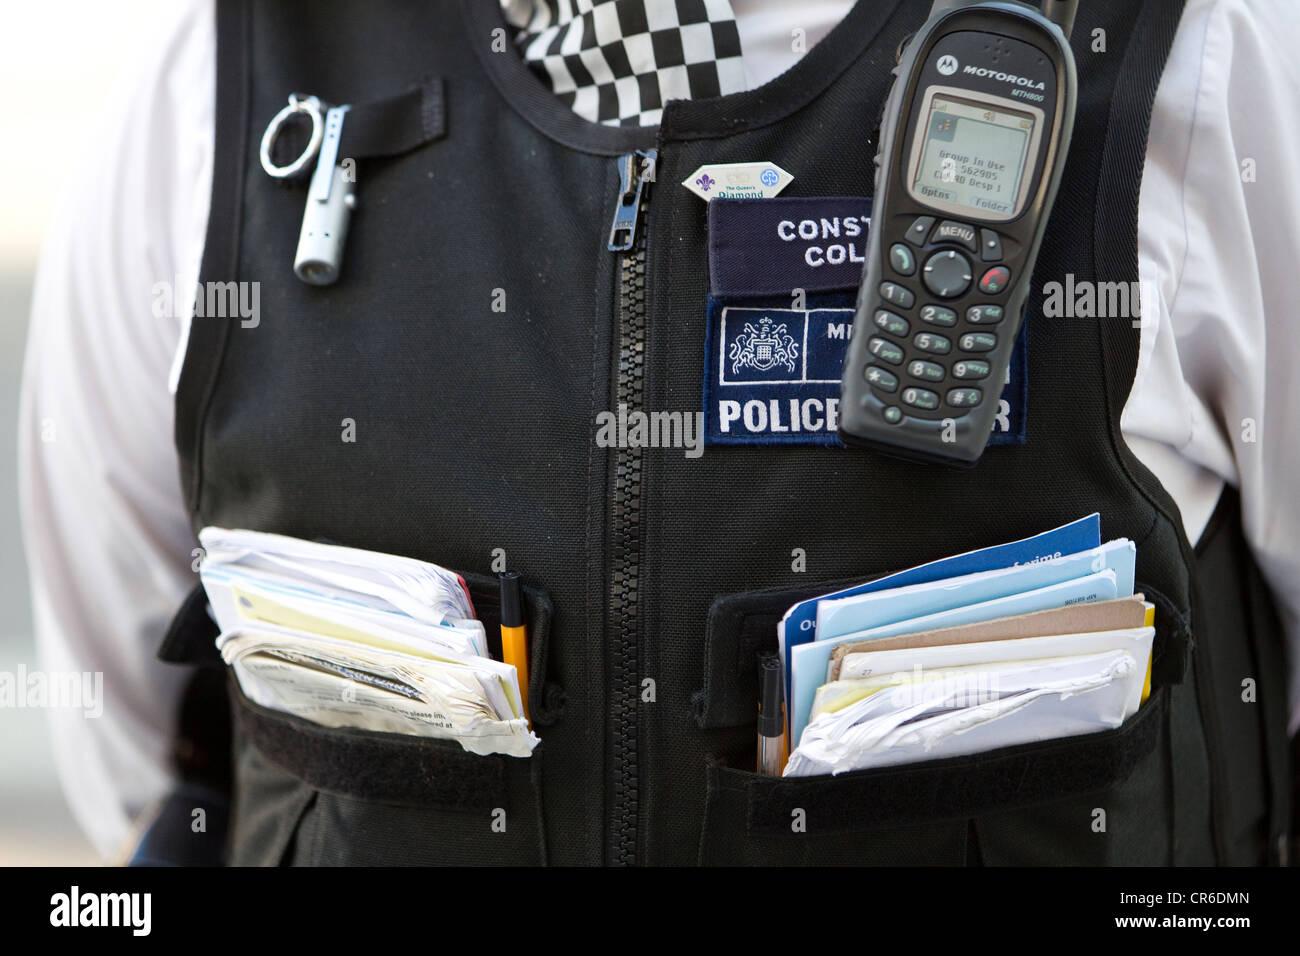 Woman Police Constable, Metropolitan Police, London, England, UK - Stock Image